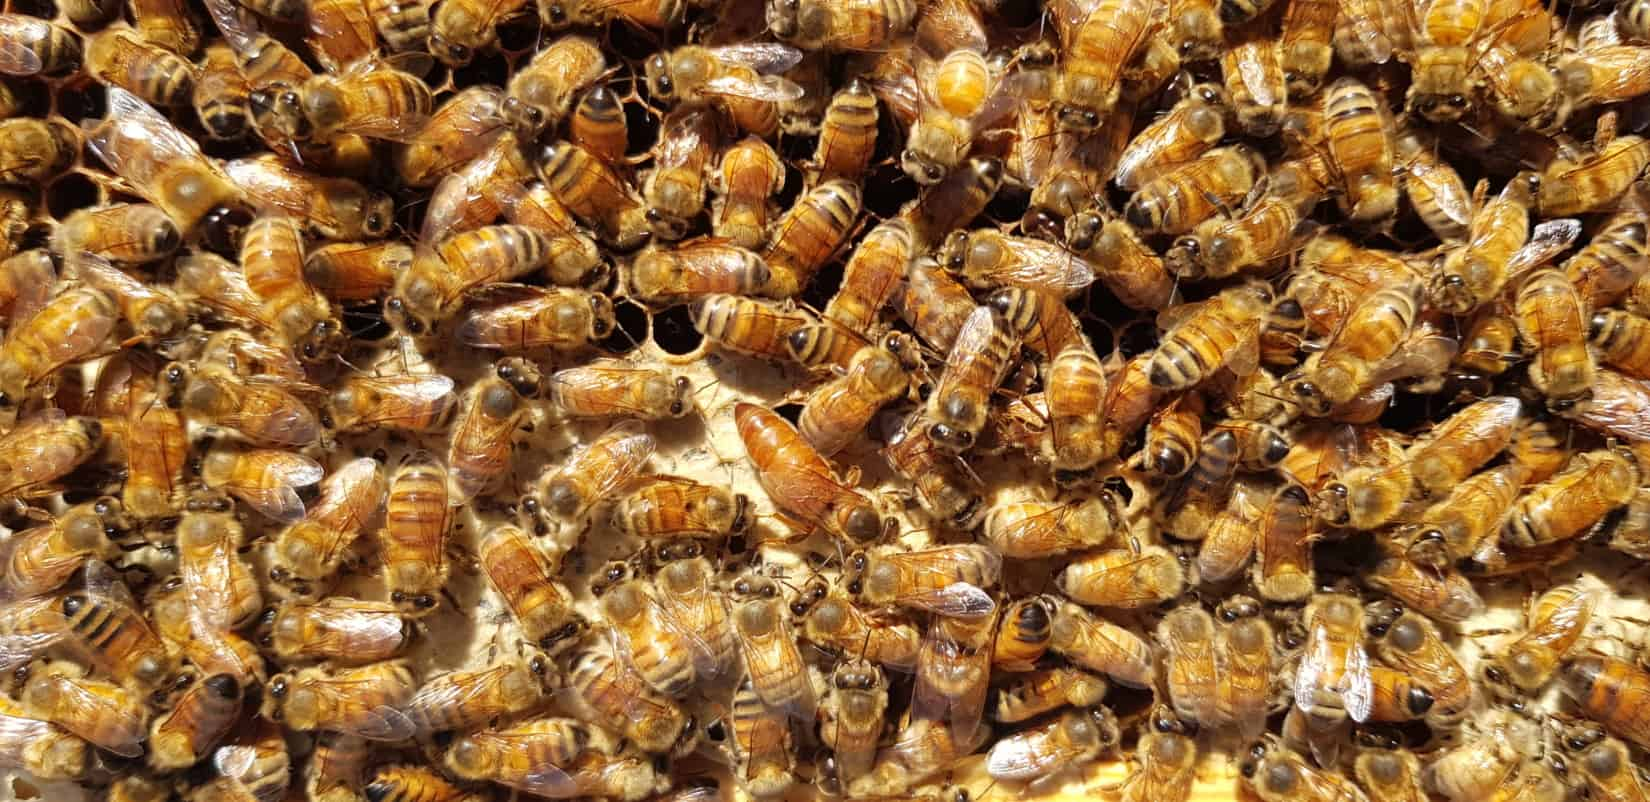 Australian Bee Products